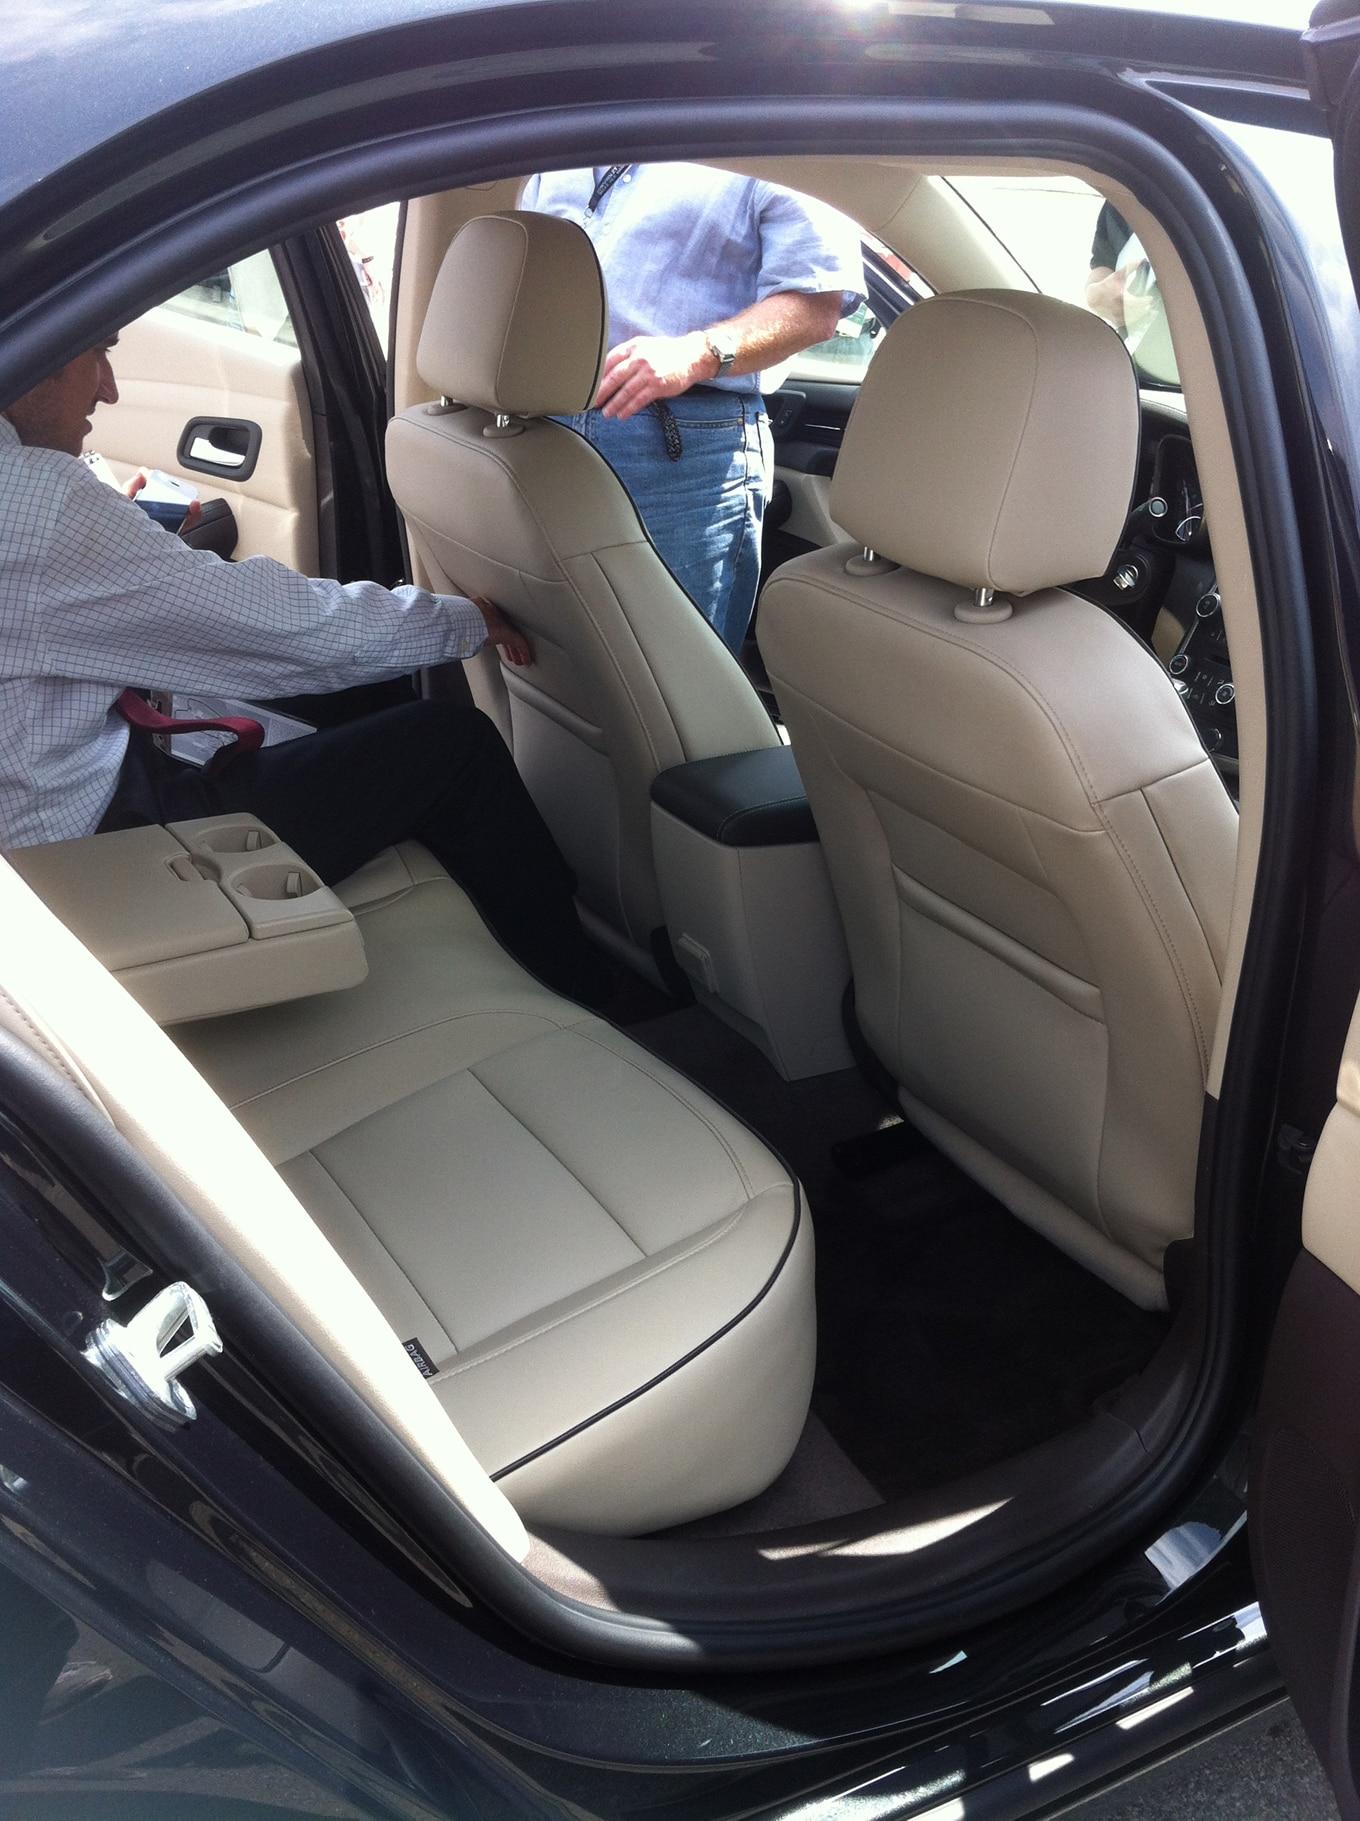 2014 Chevrolet Malibu Rear Interior